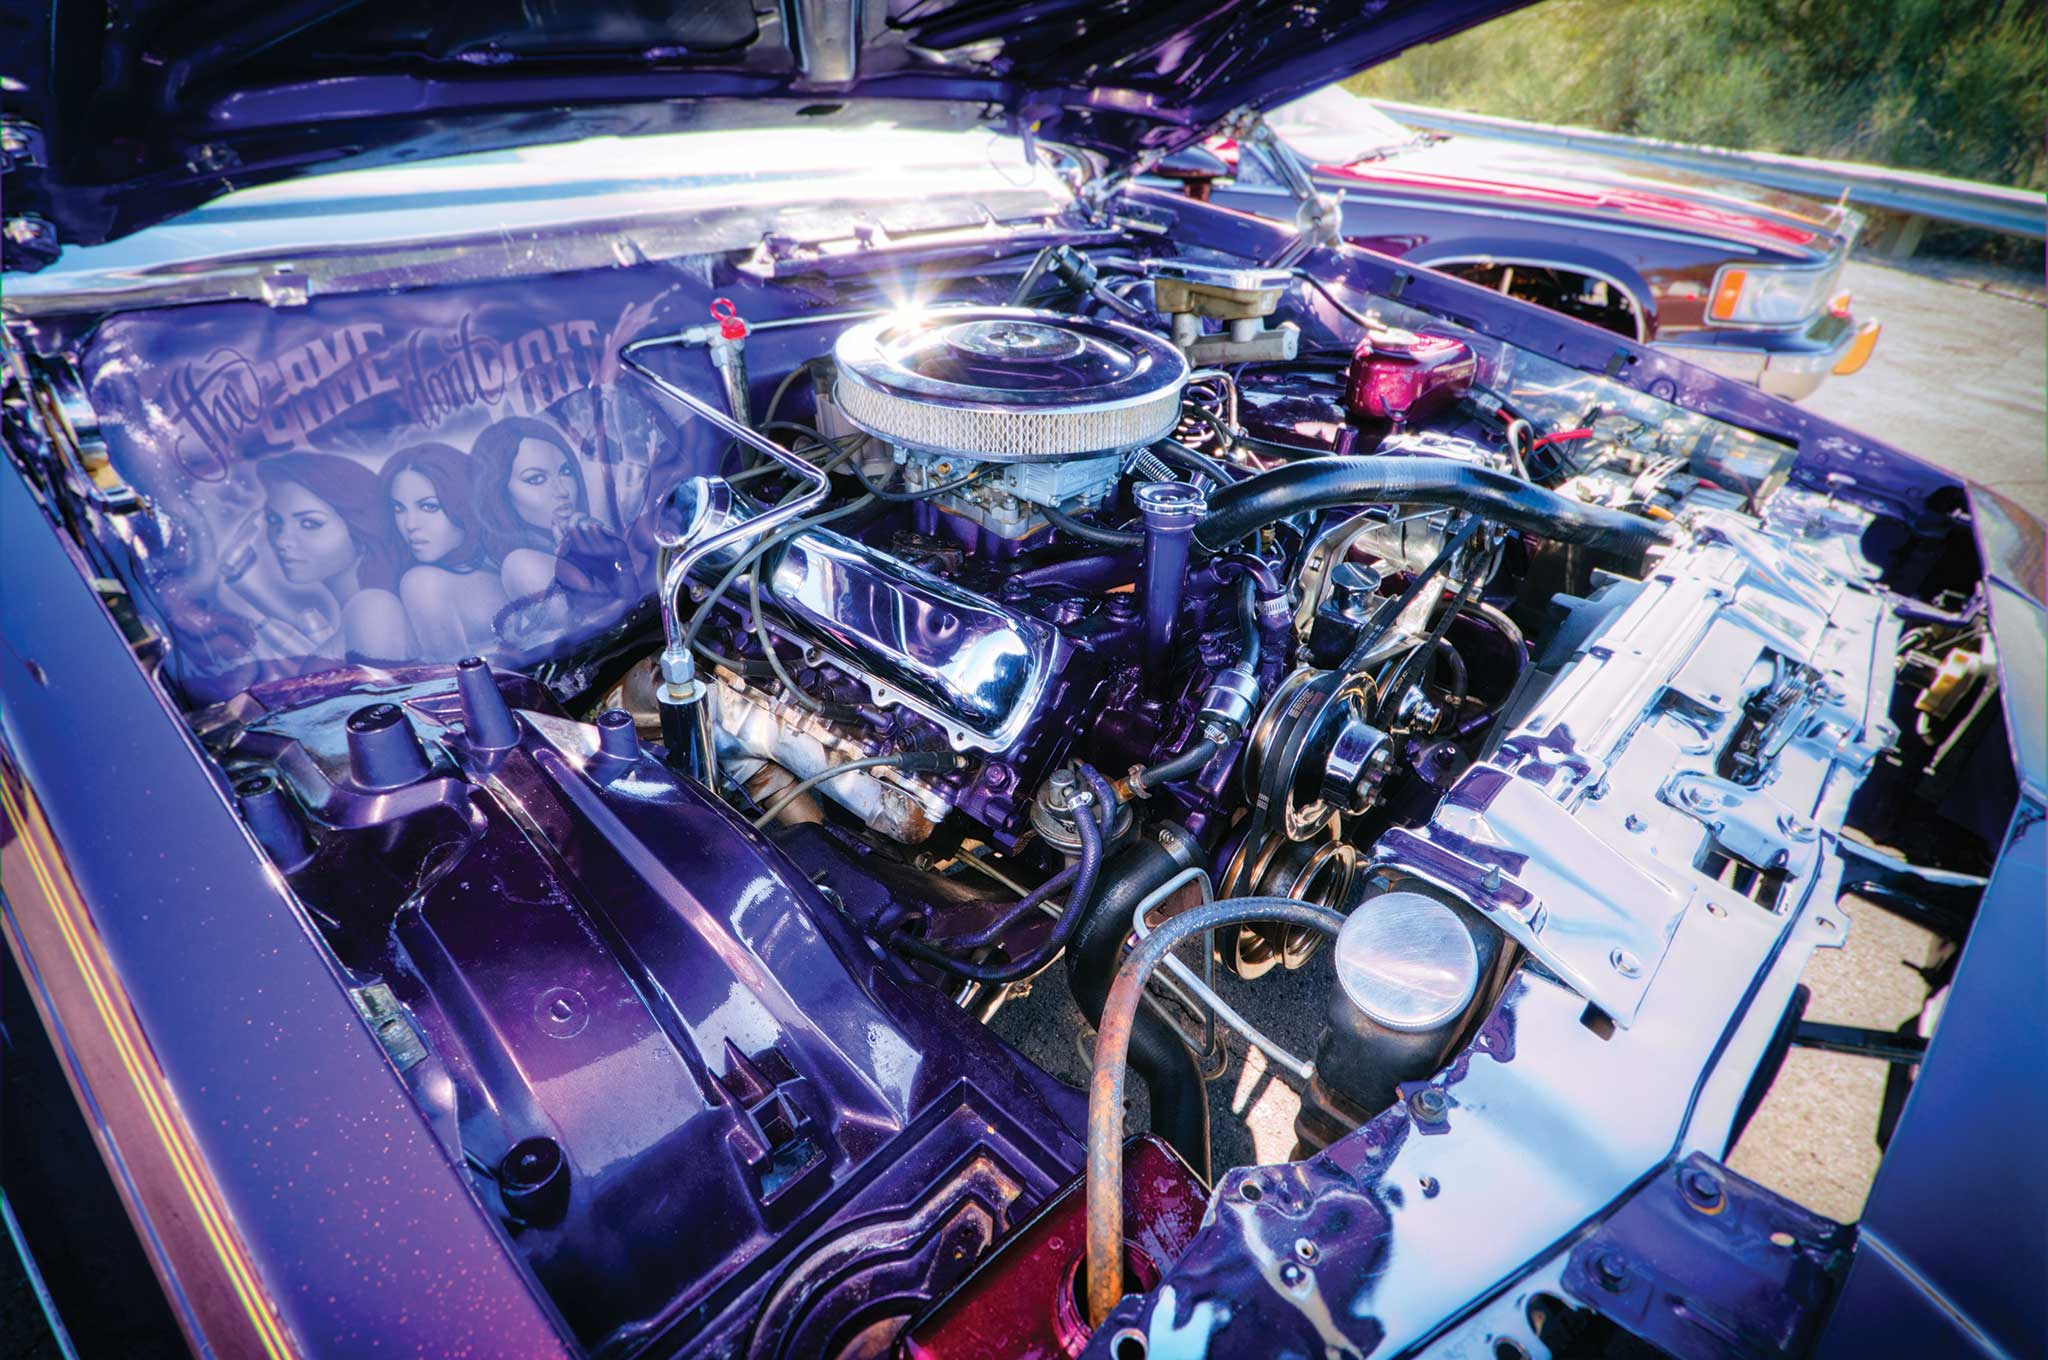 93 Cadillac Fleetwood & '84 Oldsmobile Cutlass - The Game